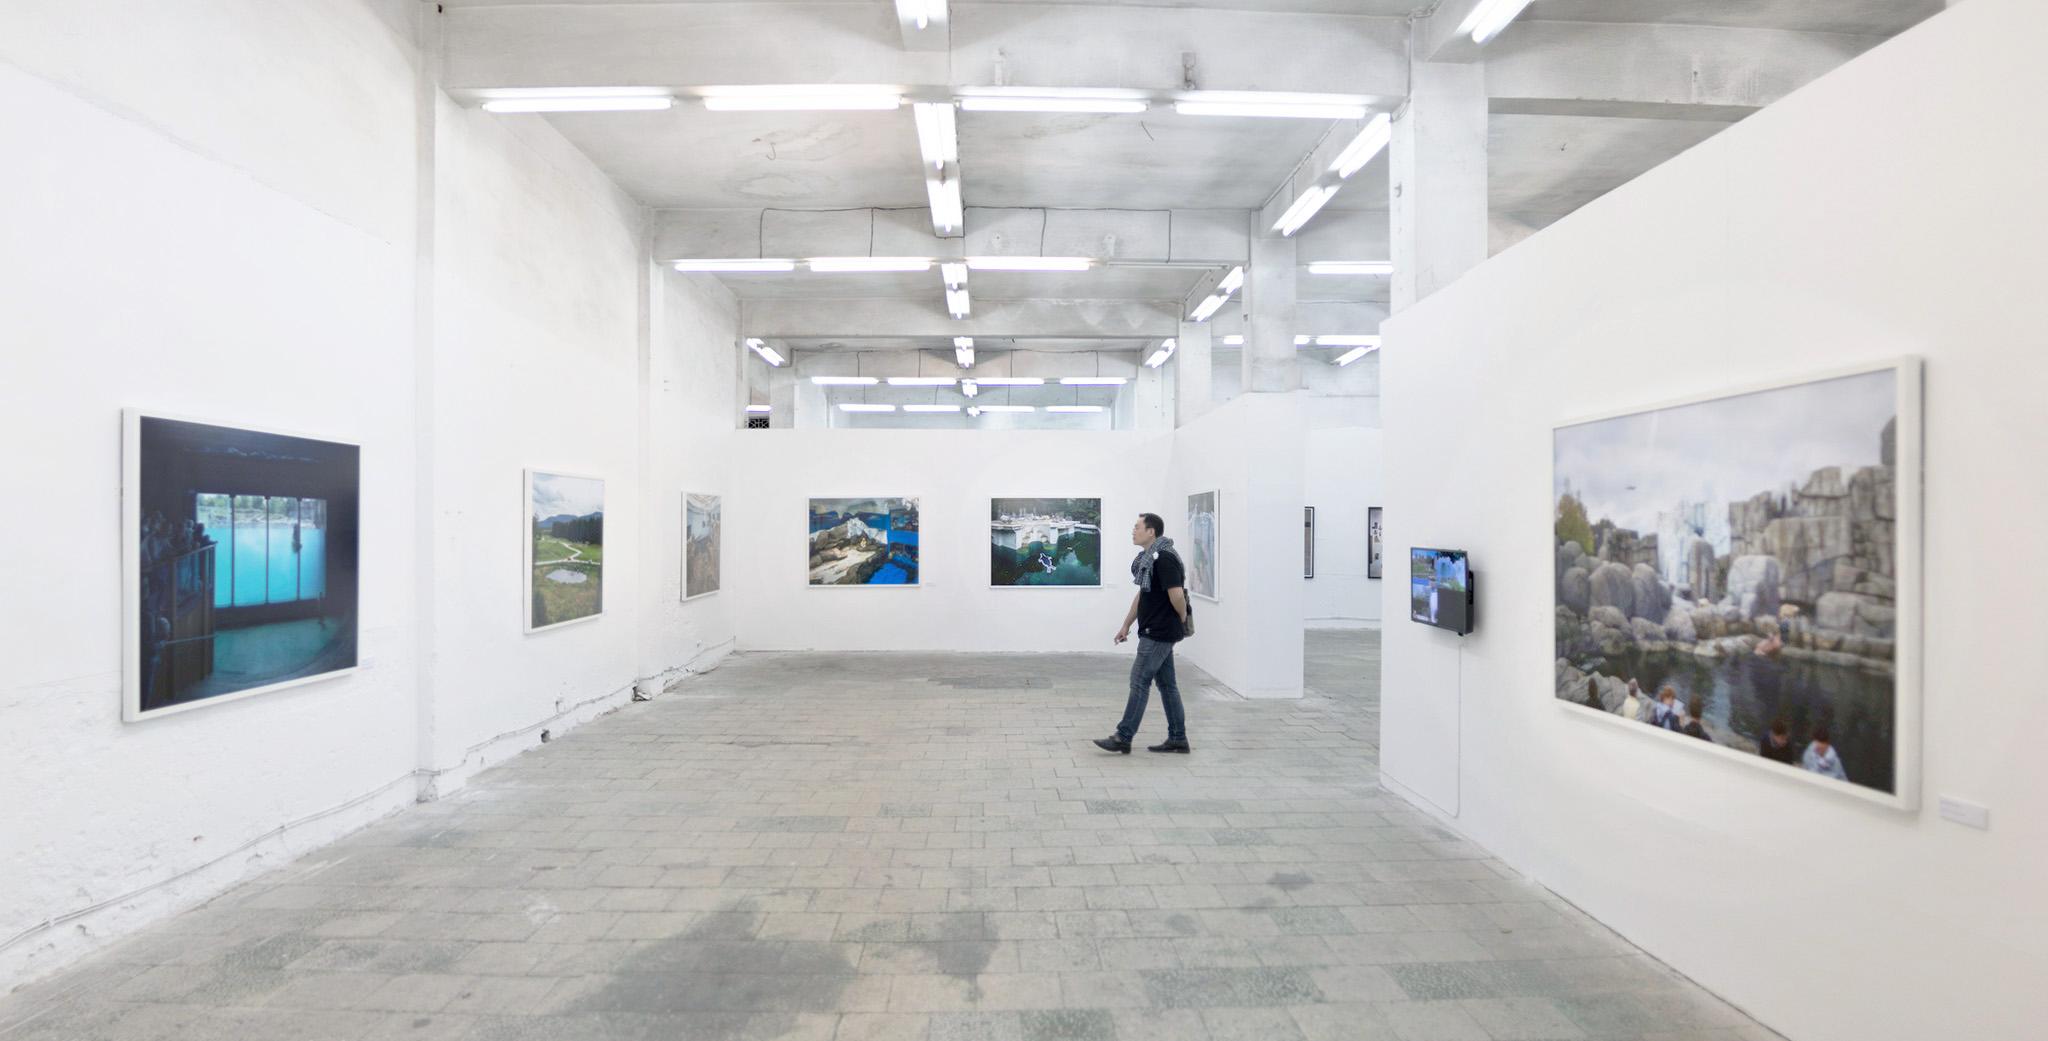 Installation, Lianzhou Foto Festival, China, 2016